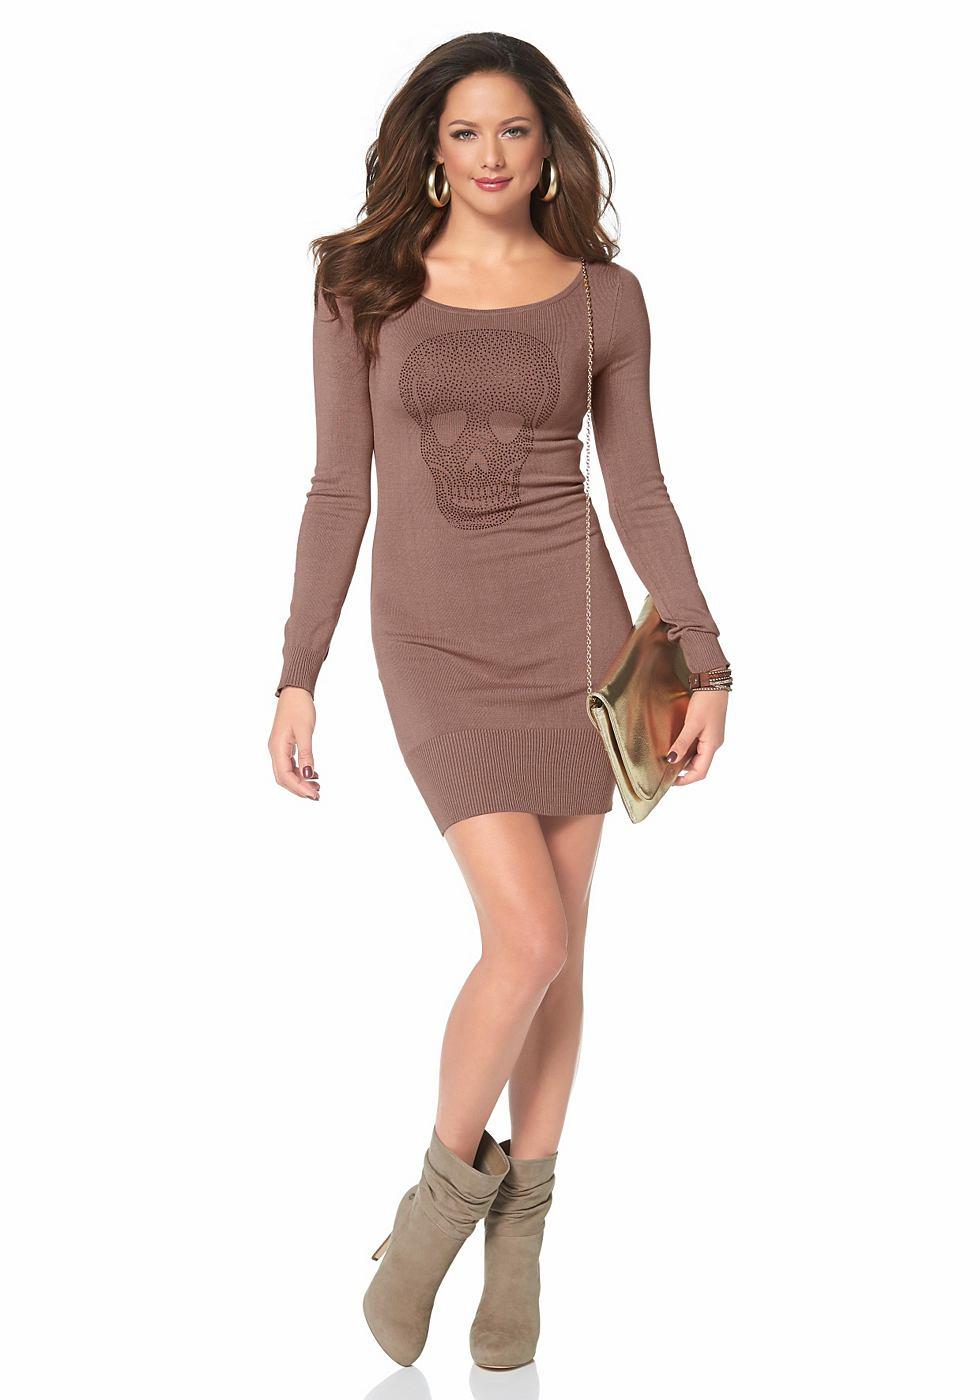 Melrose Tricot-jurk met doodskopmotief bruin